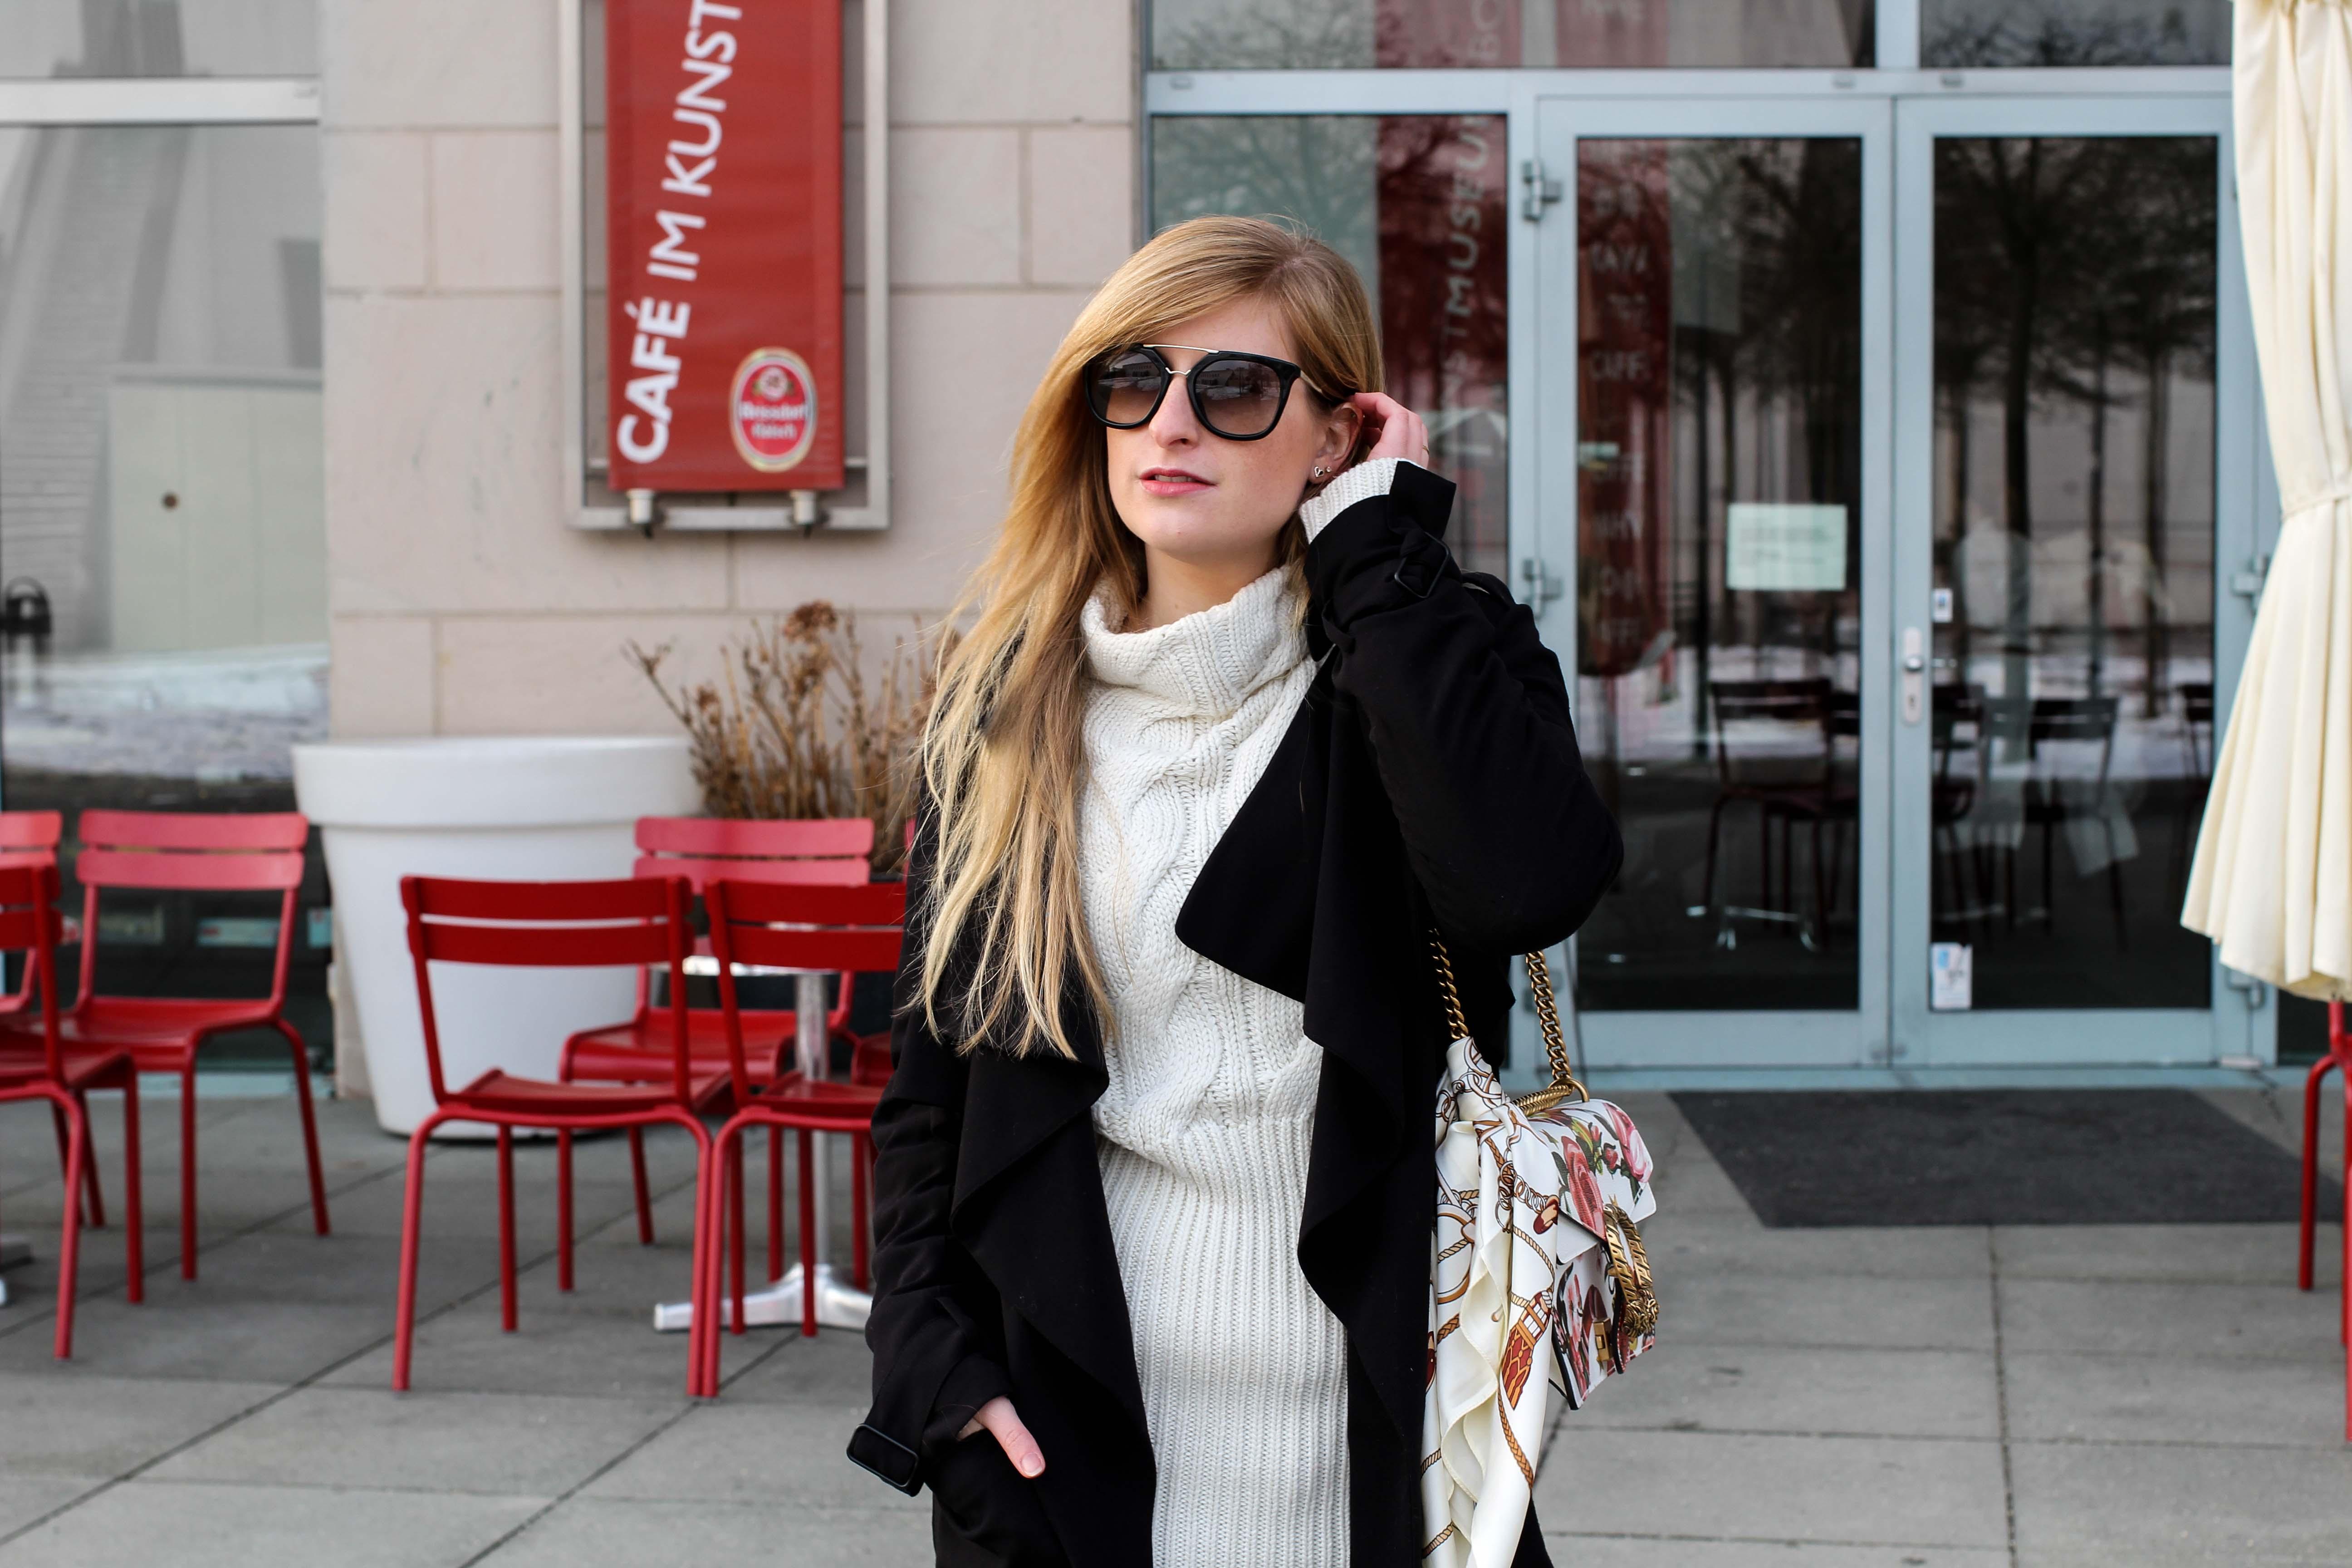 Gucci Dionysus Garden Print kombinieren Tuch Frühlingslook Wollpullover Weiß kältere Tage Sonnenbrille Prada Modeblogger Bonn OOTD 2